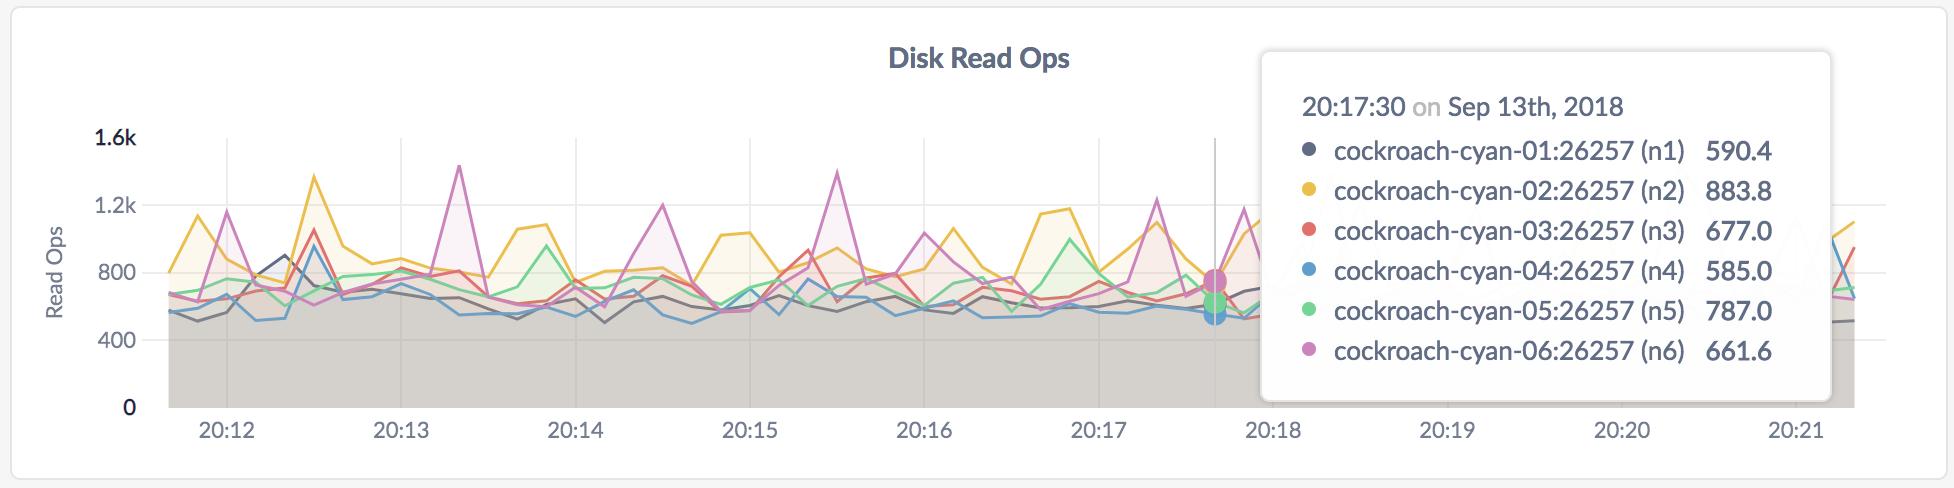 CockroachDB Admin UI Disk Read Ops graph